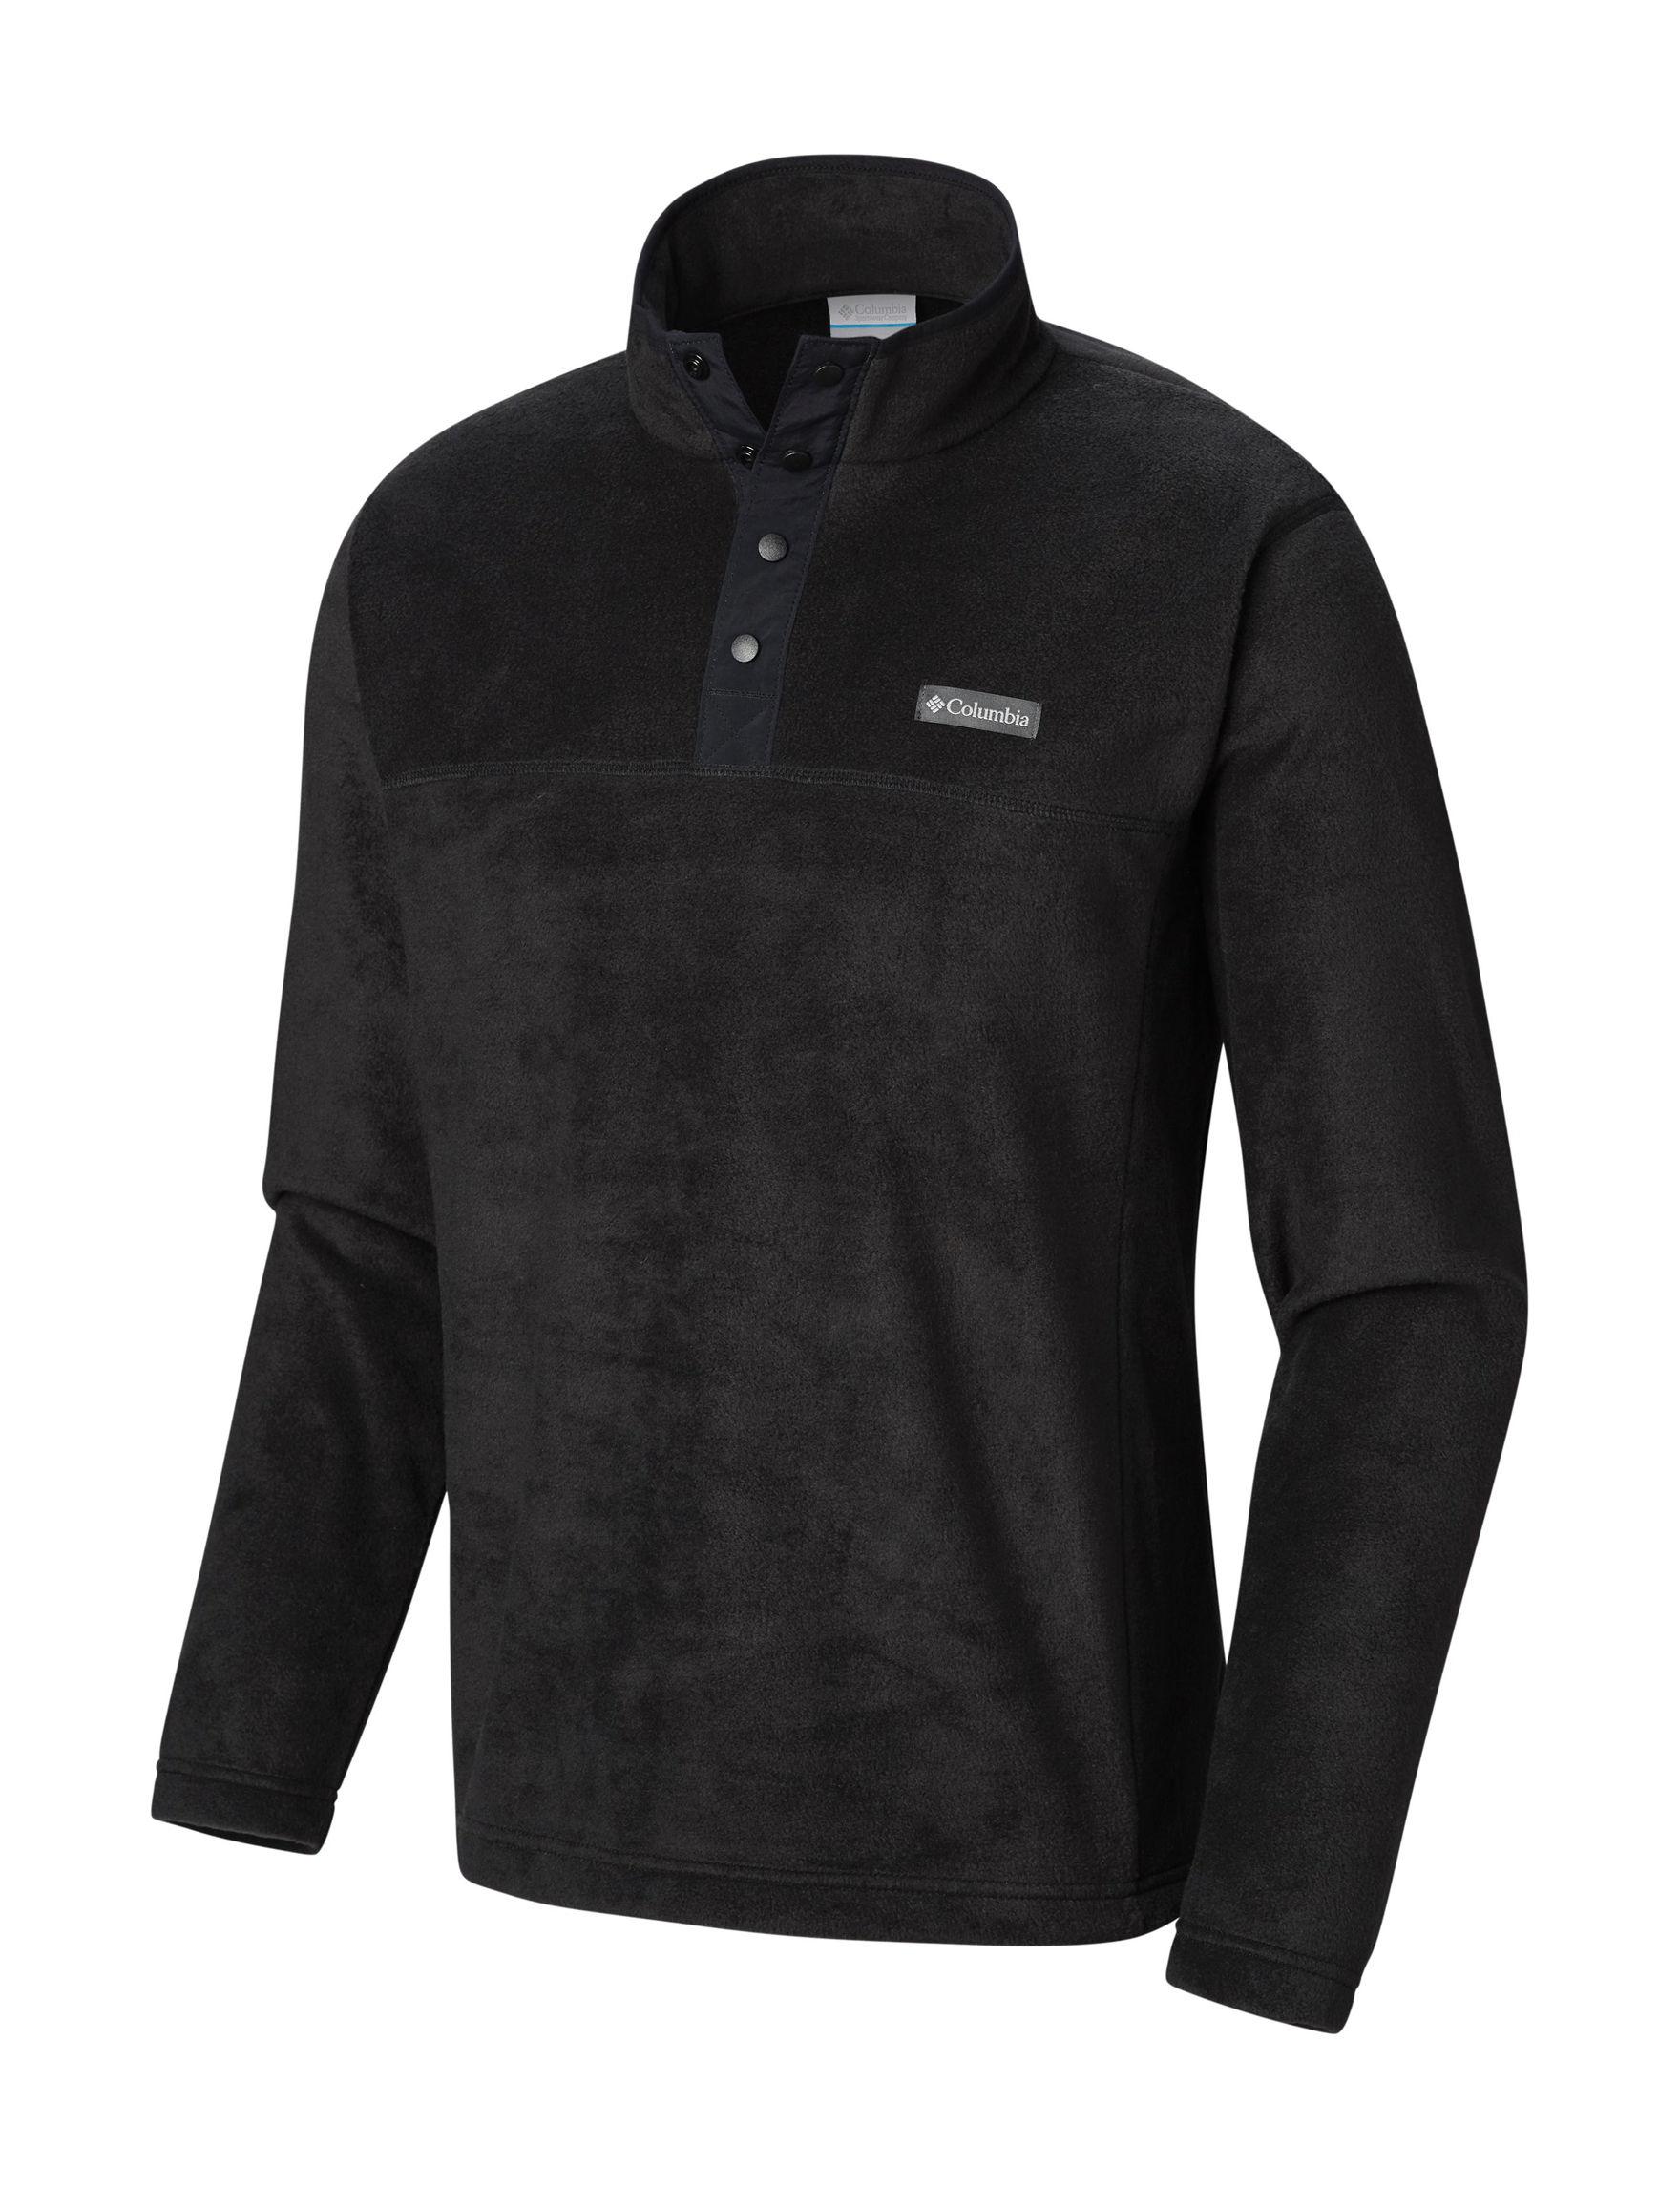 Columbia Black Fleece & Soft Shell Jackets